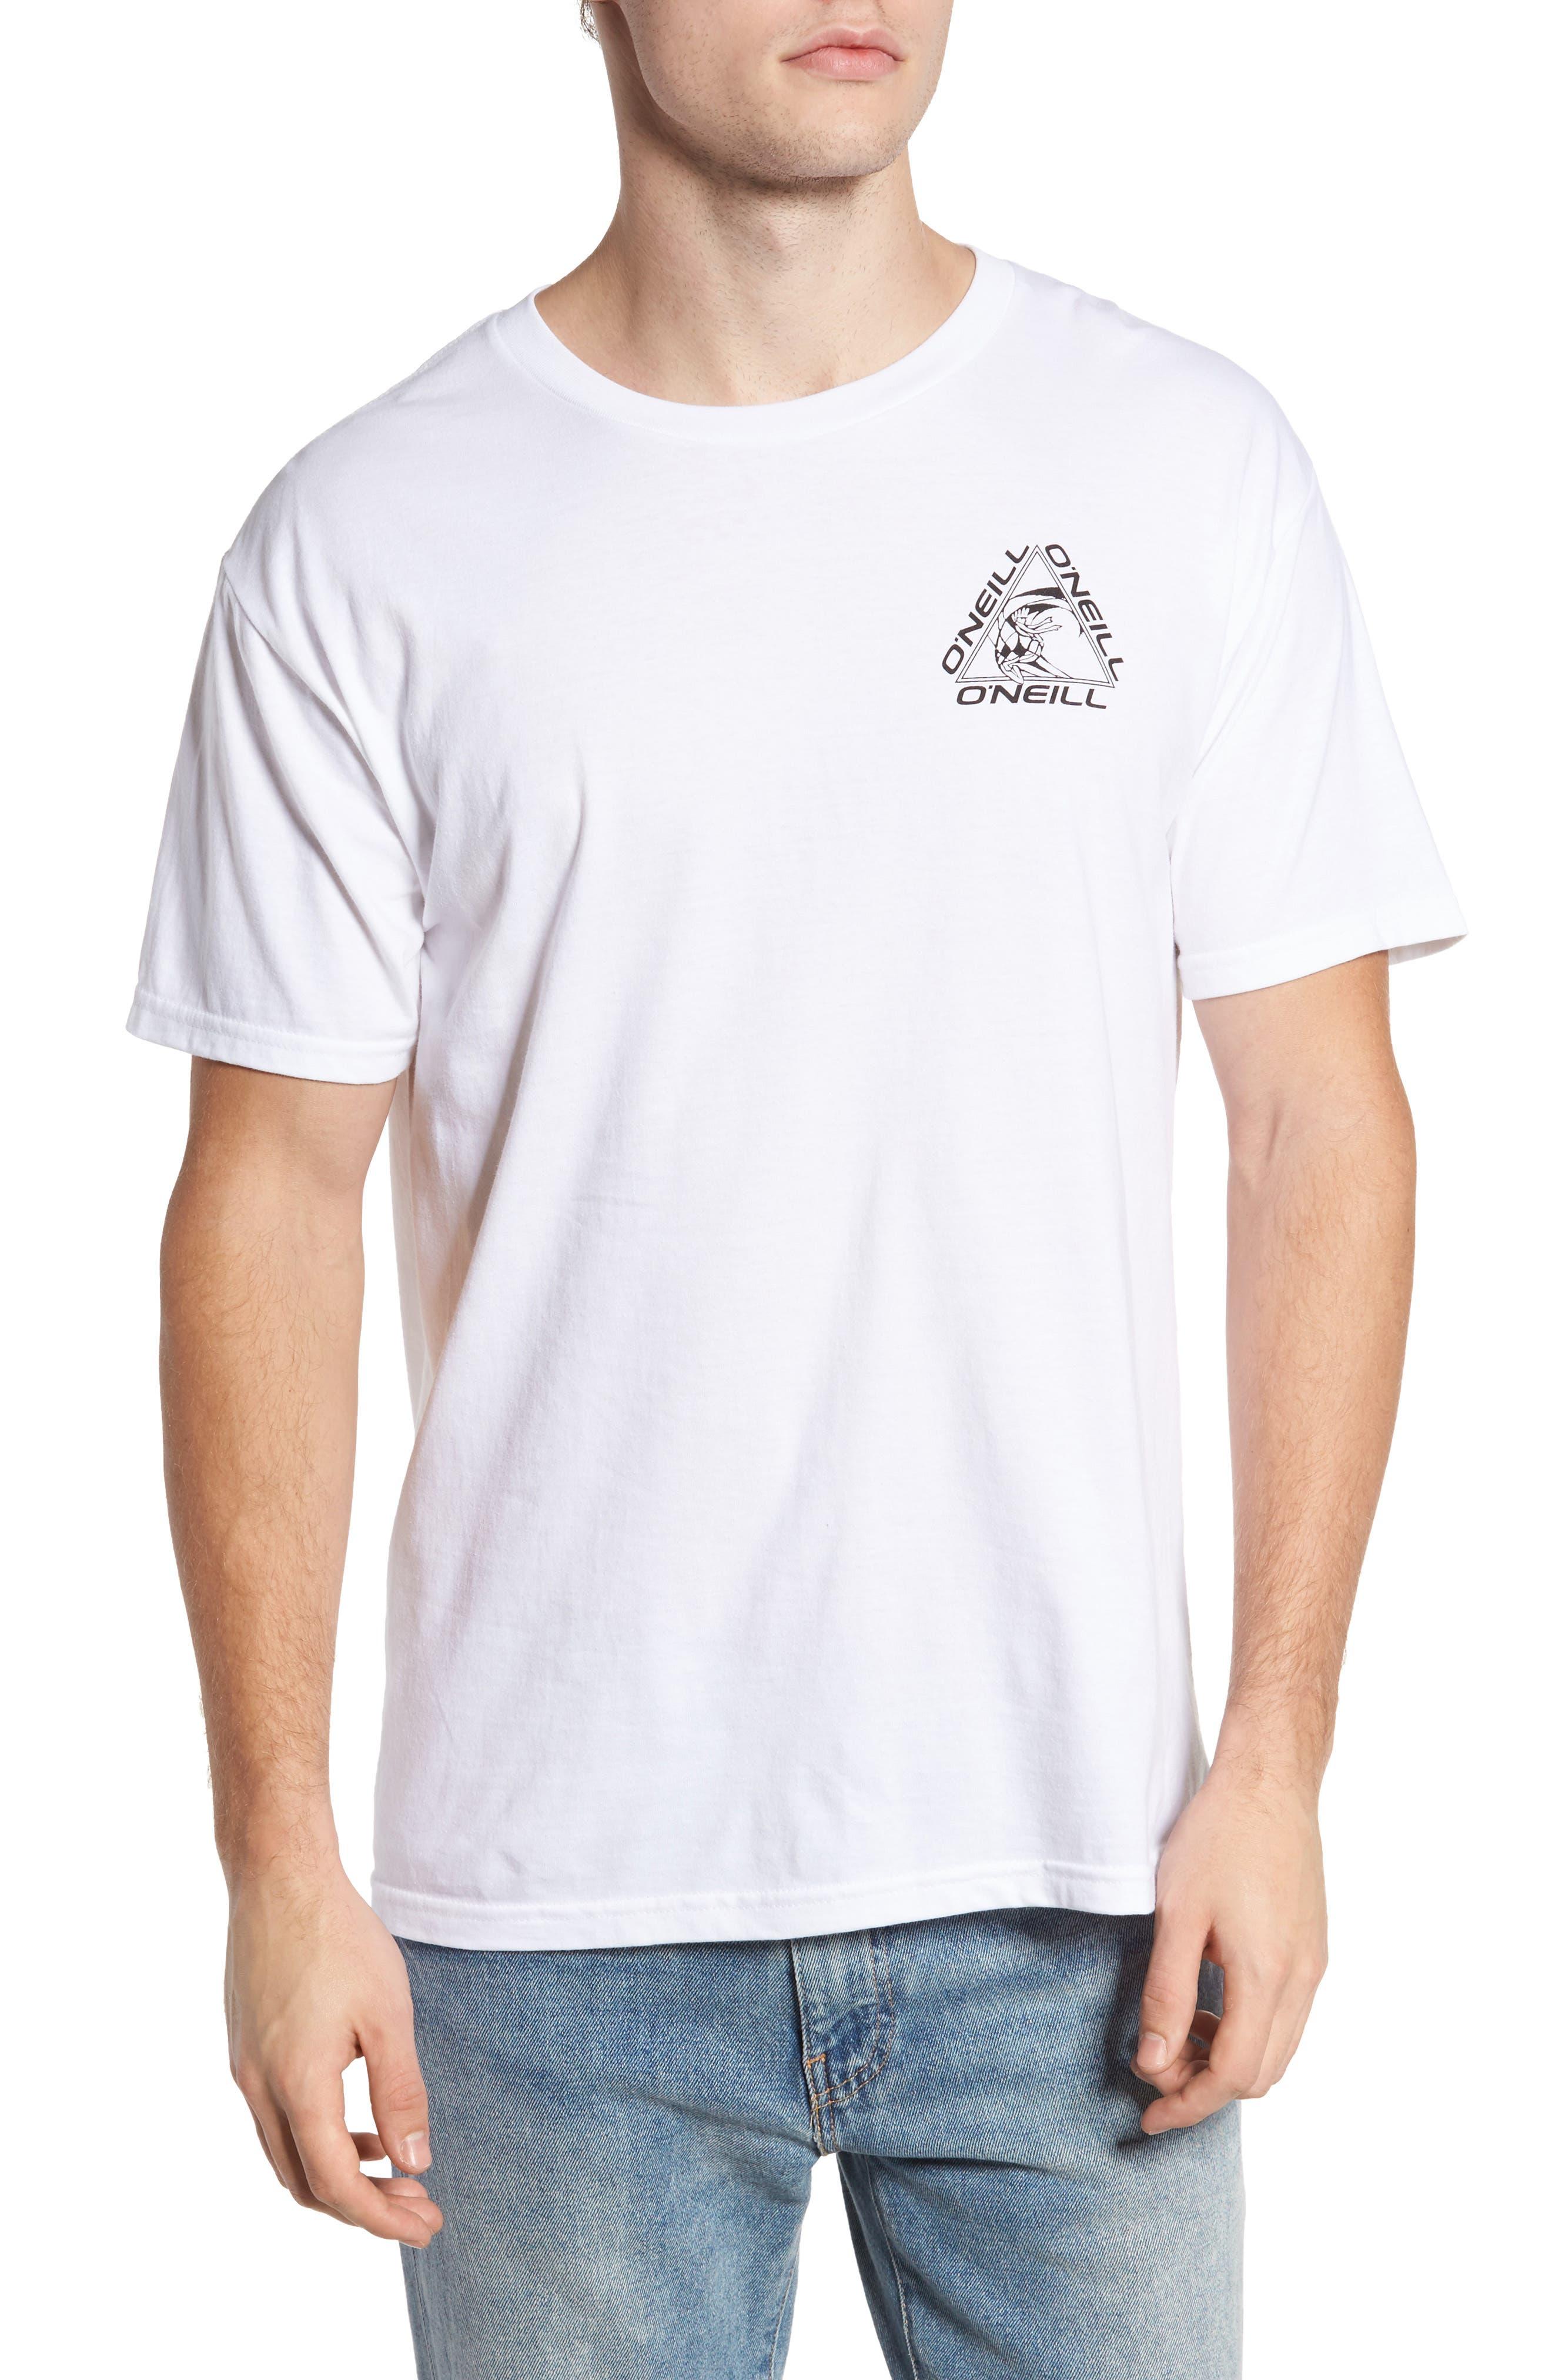 O'Neill Triad Graphic T-Shirt